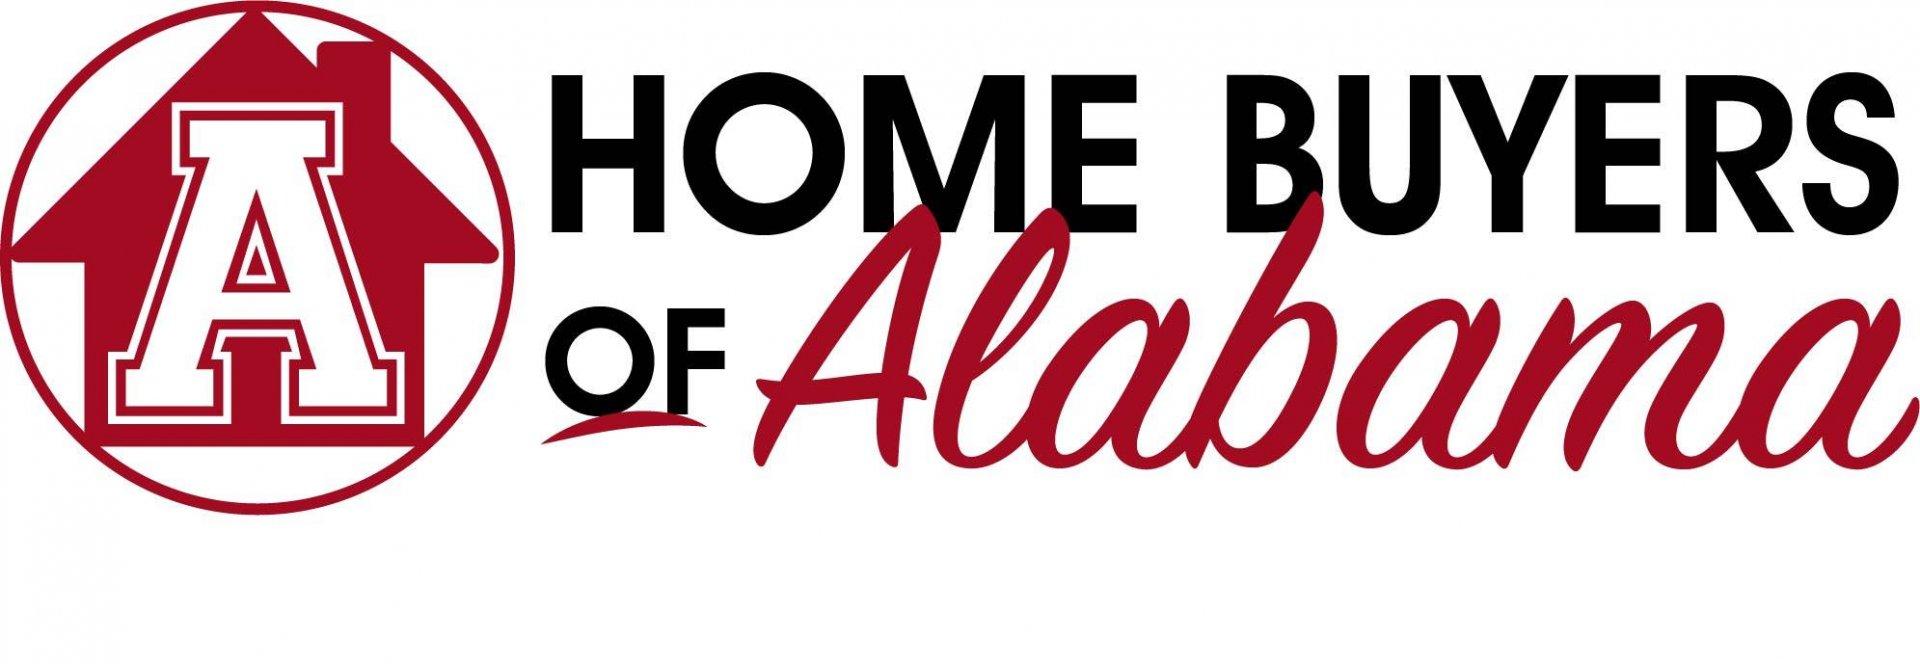 Home Buyers of Birmingham logo